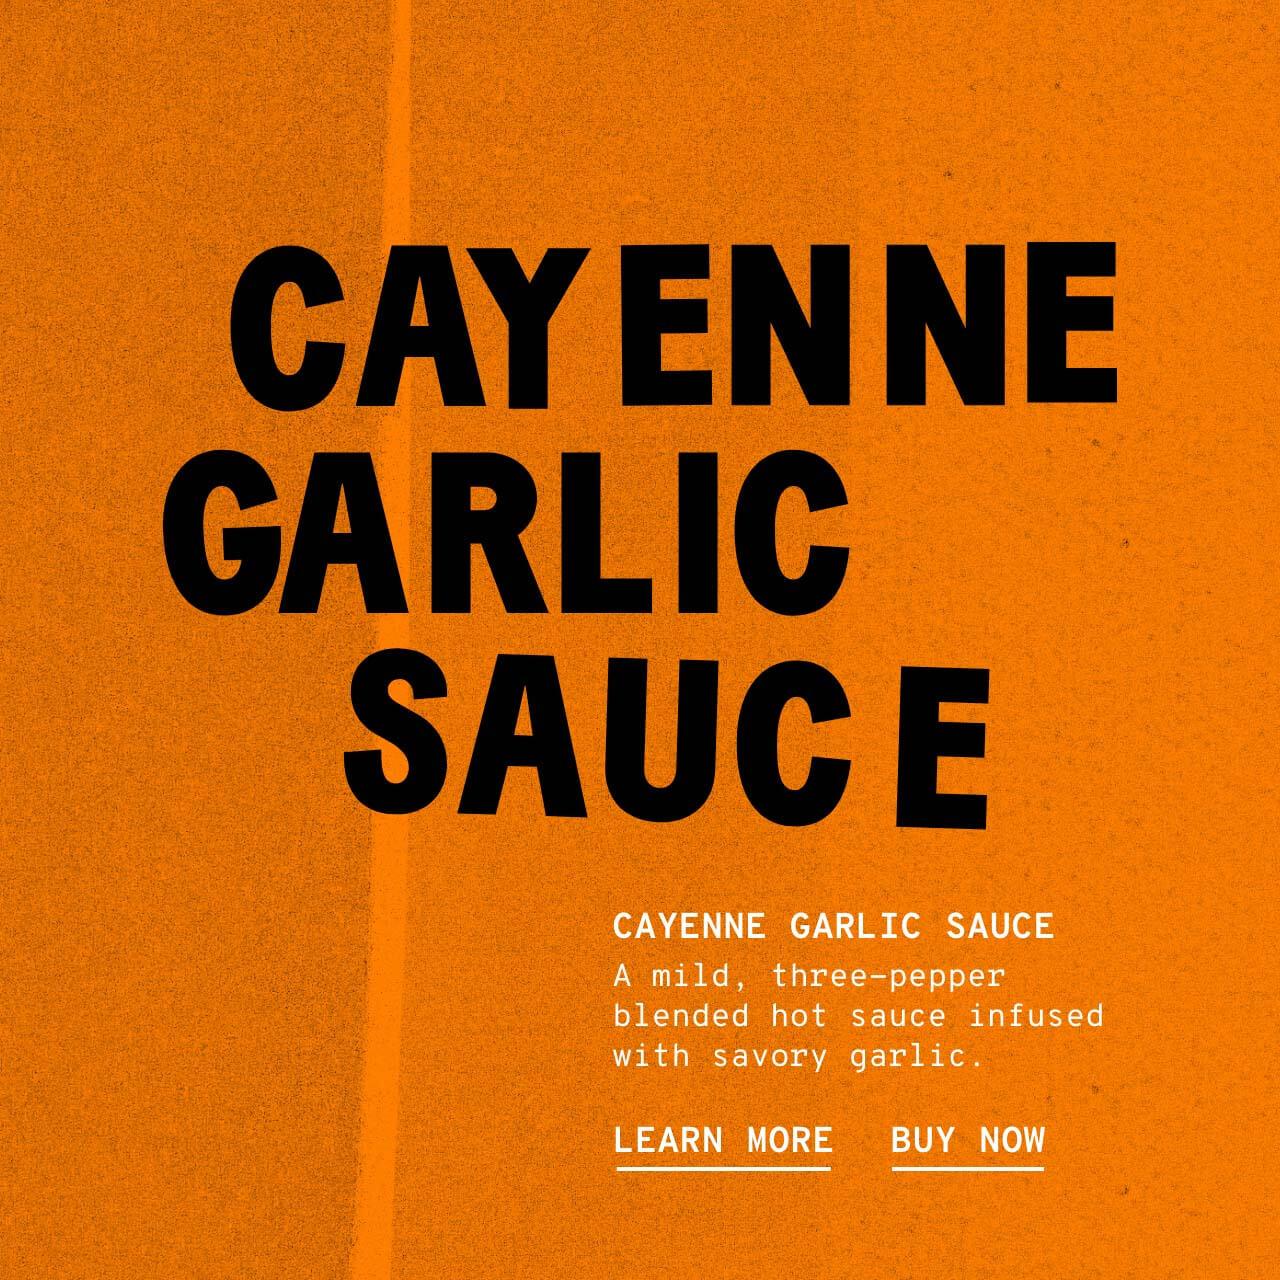 Cayene Garlic Sauce - Description